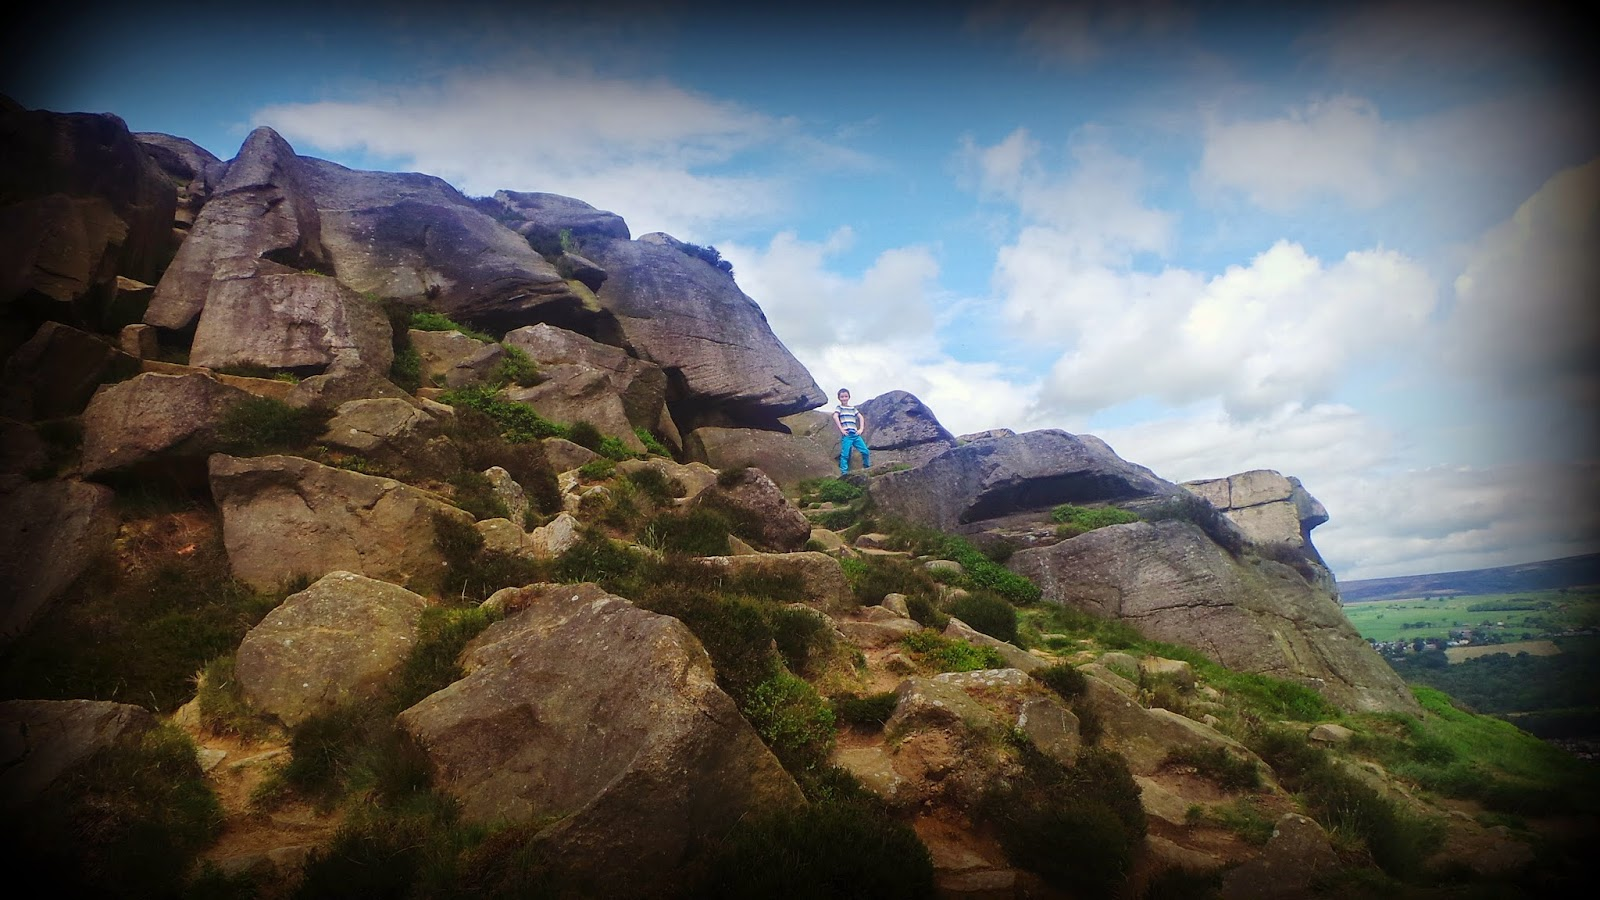 yorkshire rocks exploring